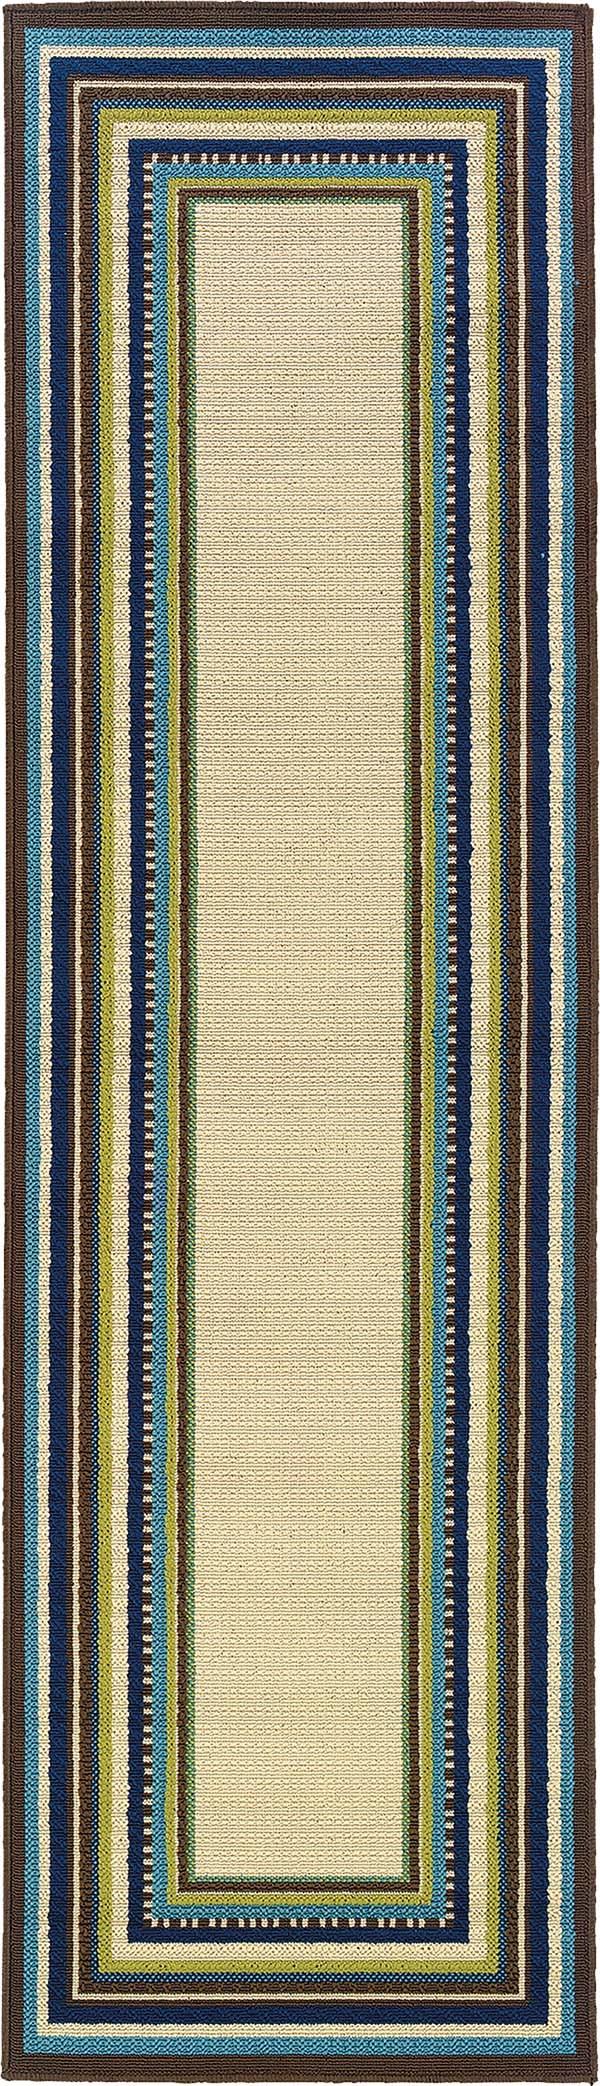 Ivory, Blue Bordered Area Rug